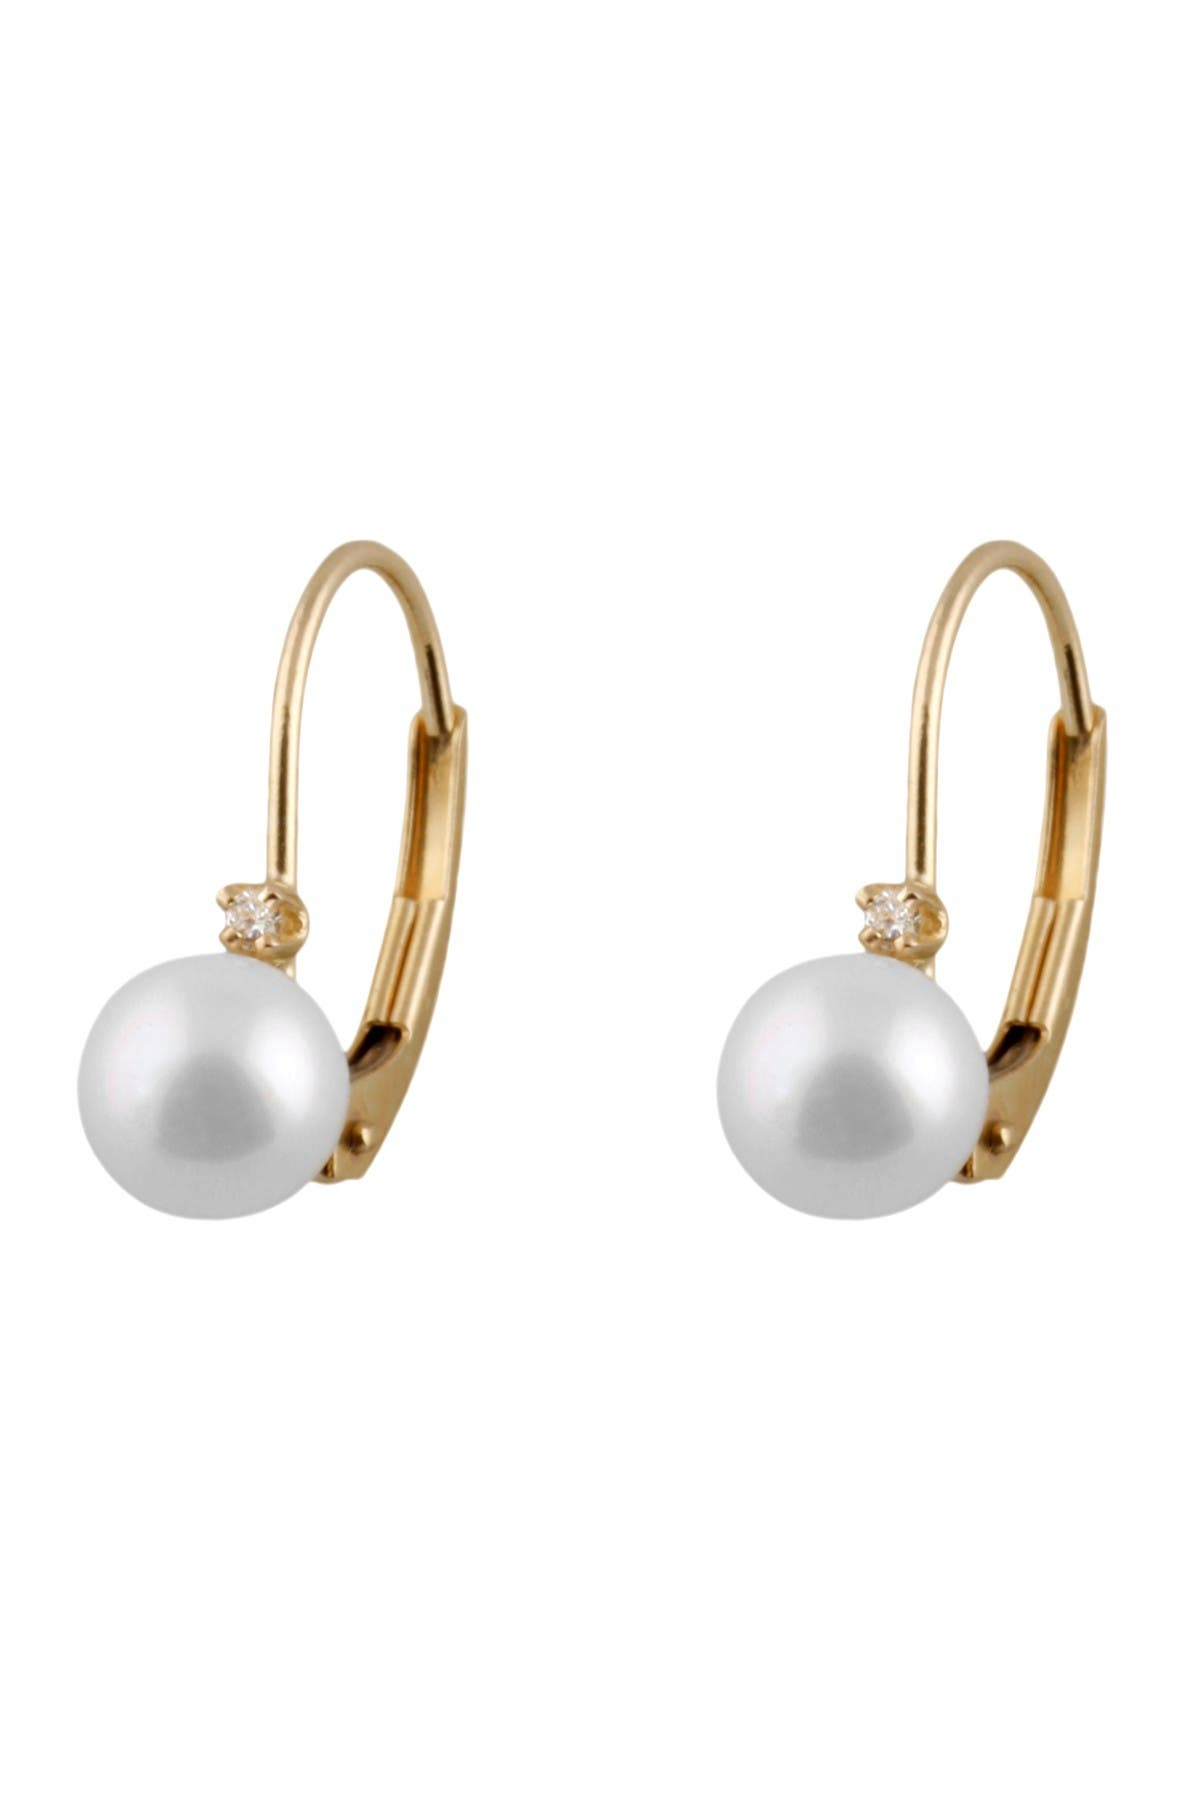 Image of Splendid Pearls 14K Yellow Gold 5-5.5mm Akoya Pearl & Diamond Earrings